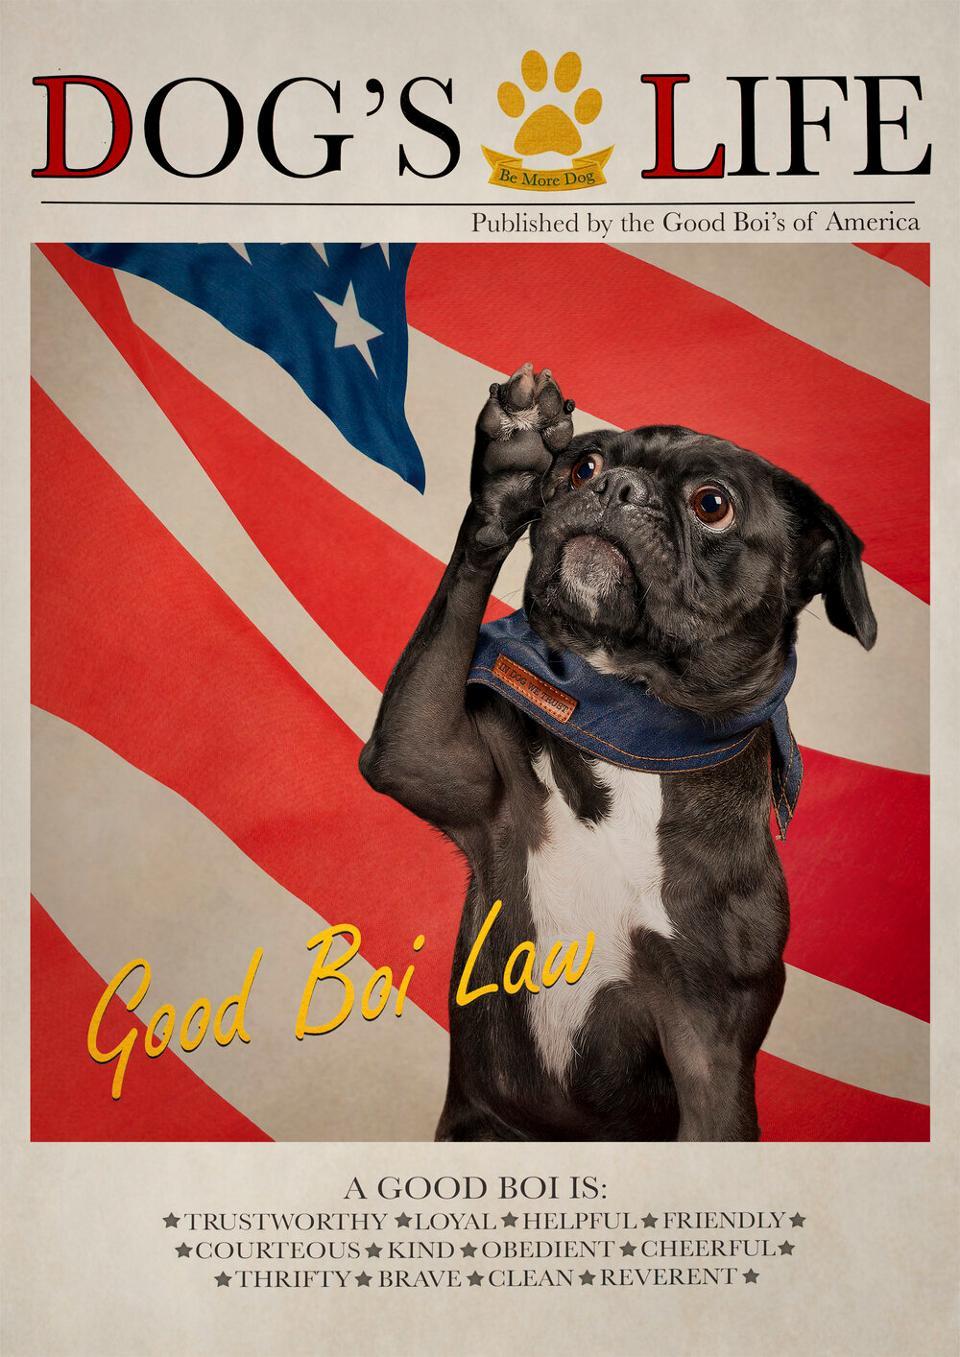 Patriotic Dog in a magazine's cover